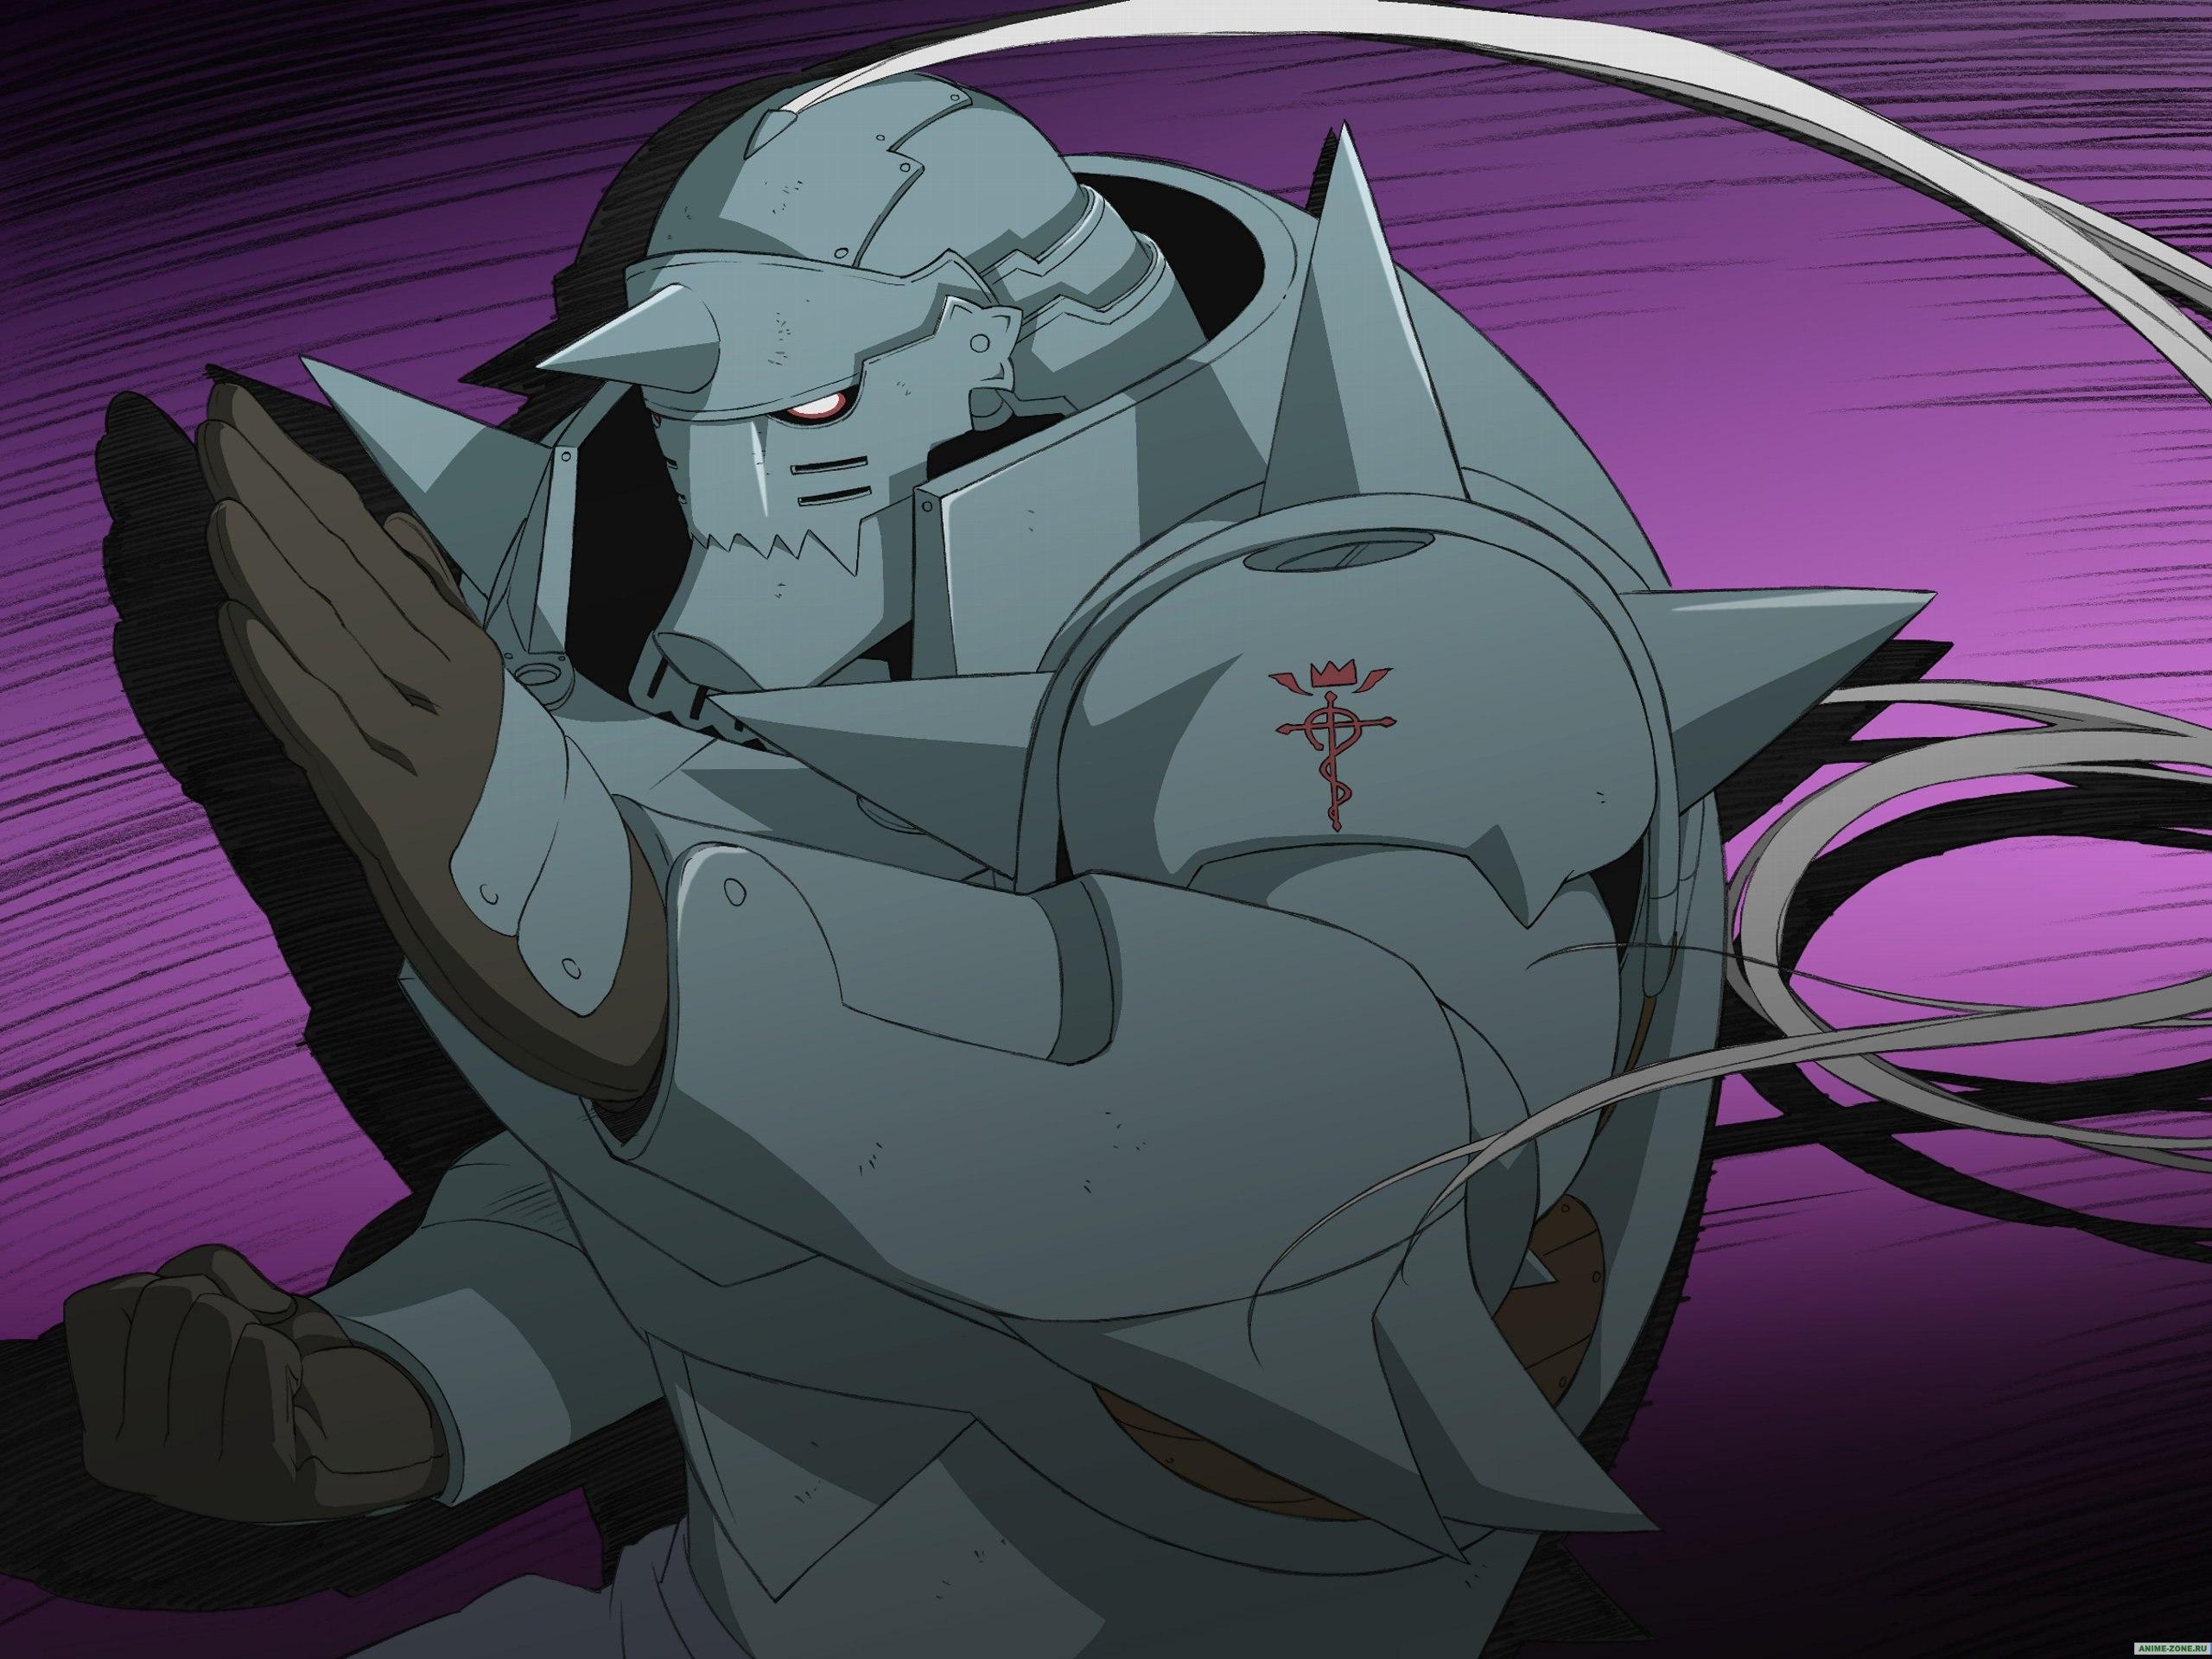 Alphonse Elric/#1042405 - Zerochan Fullmetal Alchemist Alphonse Elric